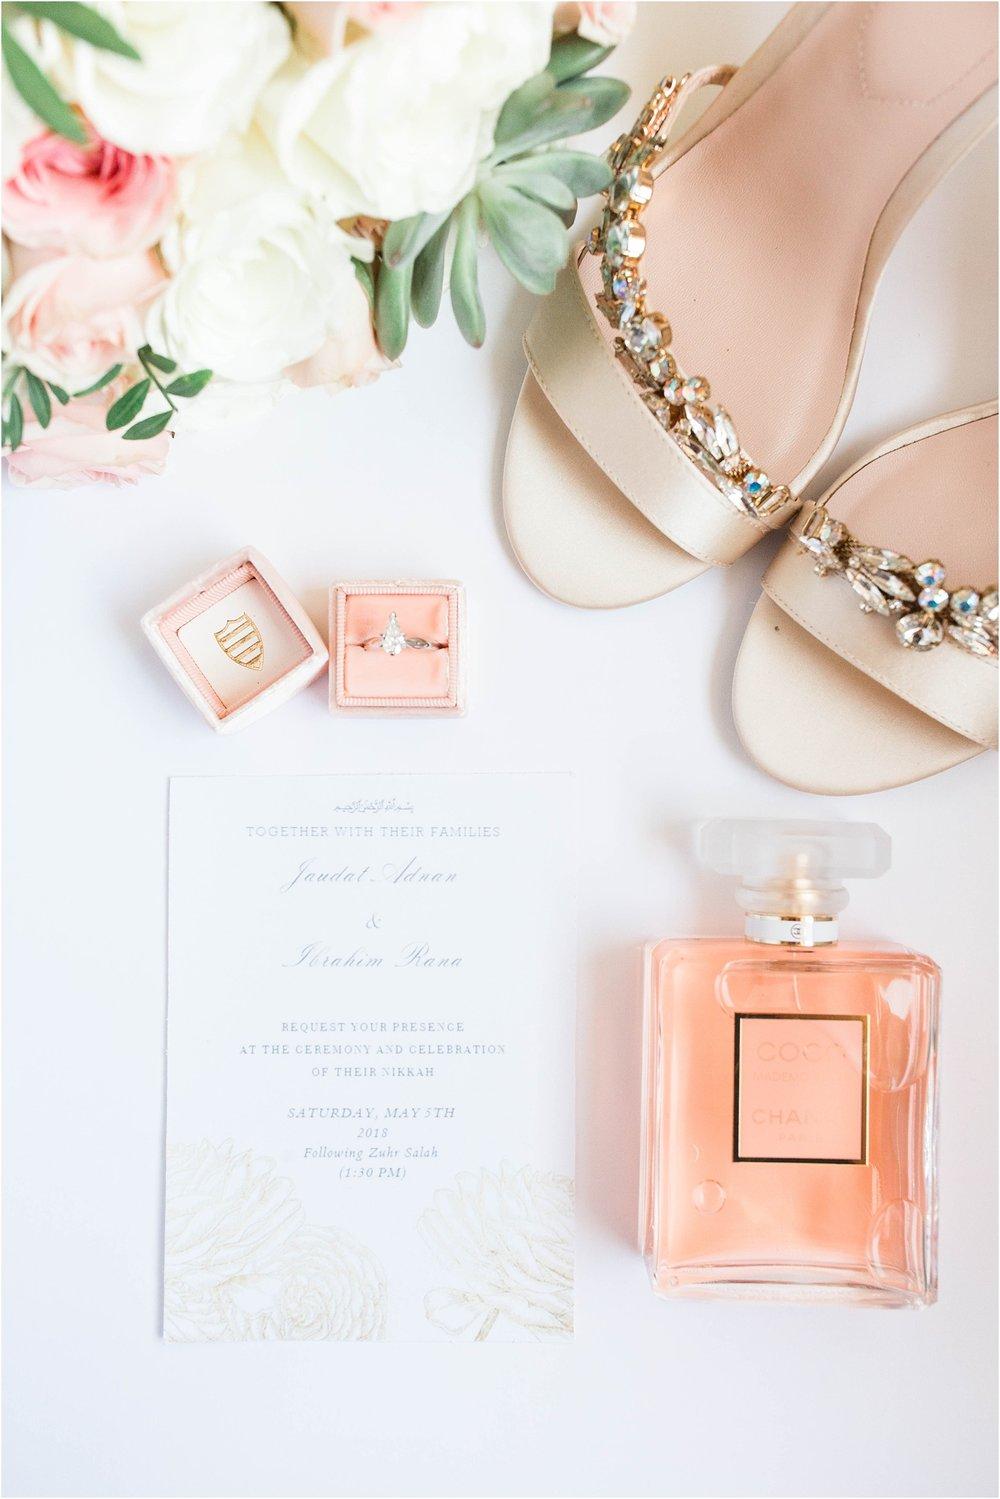 Jame-Masjid-Coopers-Mosque-Kariya-Park-Cherry-Blossoms-Wedding-Toronto-Mississauga-Brampton-Scarborough-GTA-Pakistani-Indian-Wedding-Engagement-Photographer-Photography_0005.jpg